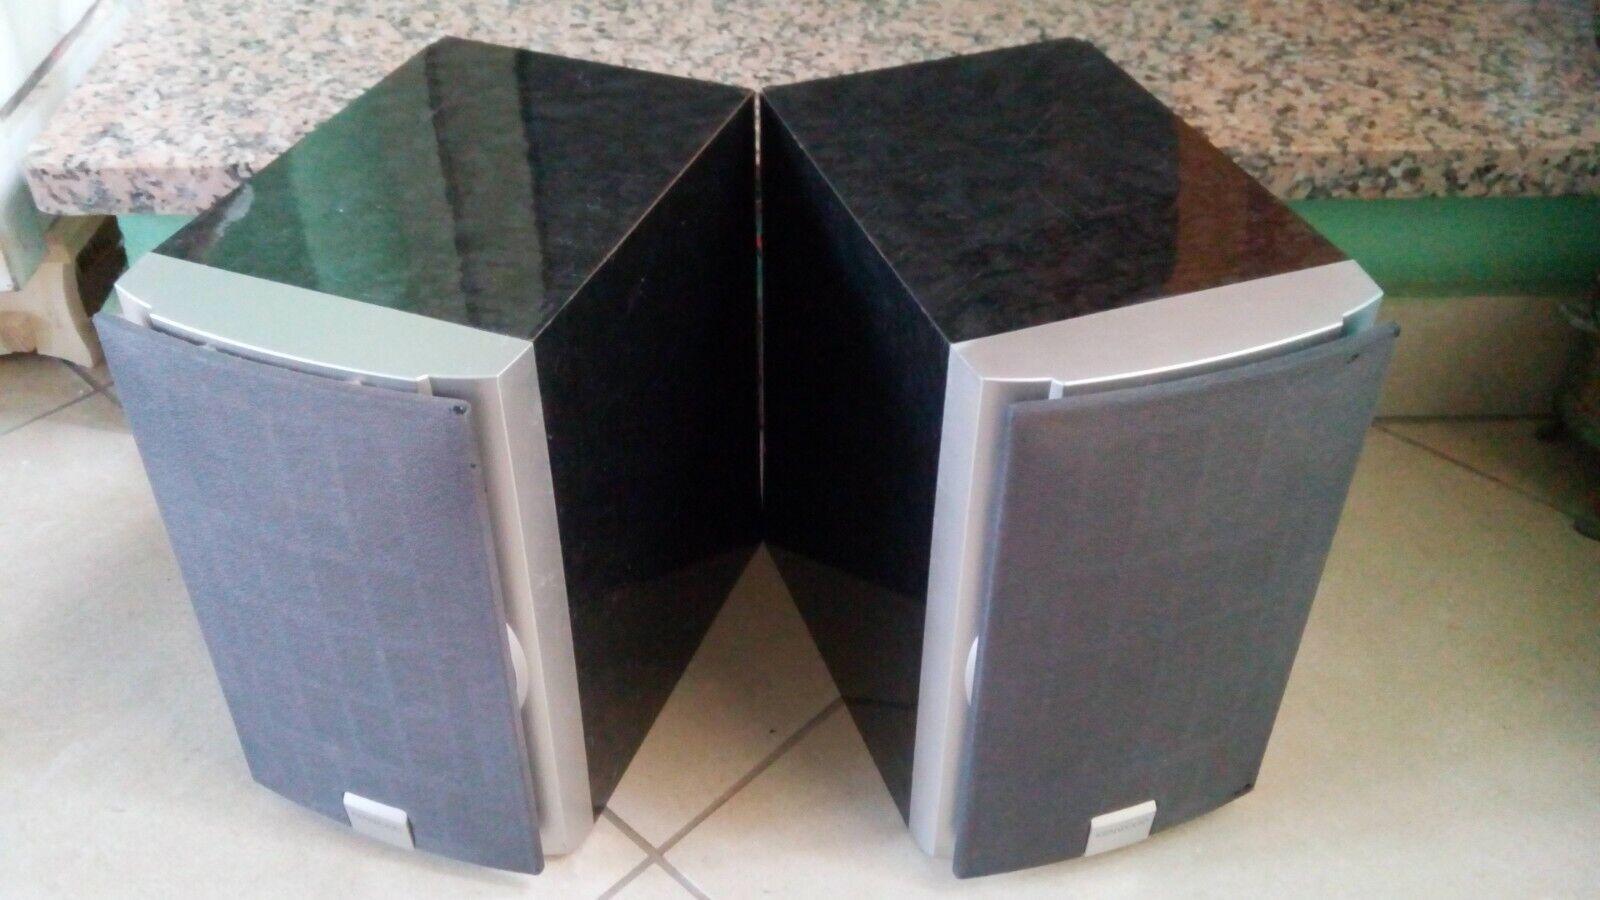 Kenwood LS-M31, 2-way speakers, undamaged drivers, 20 W, 4 Ohms